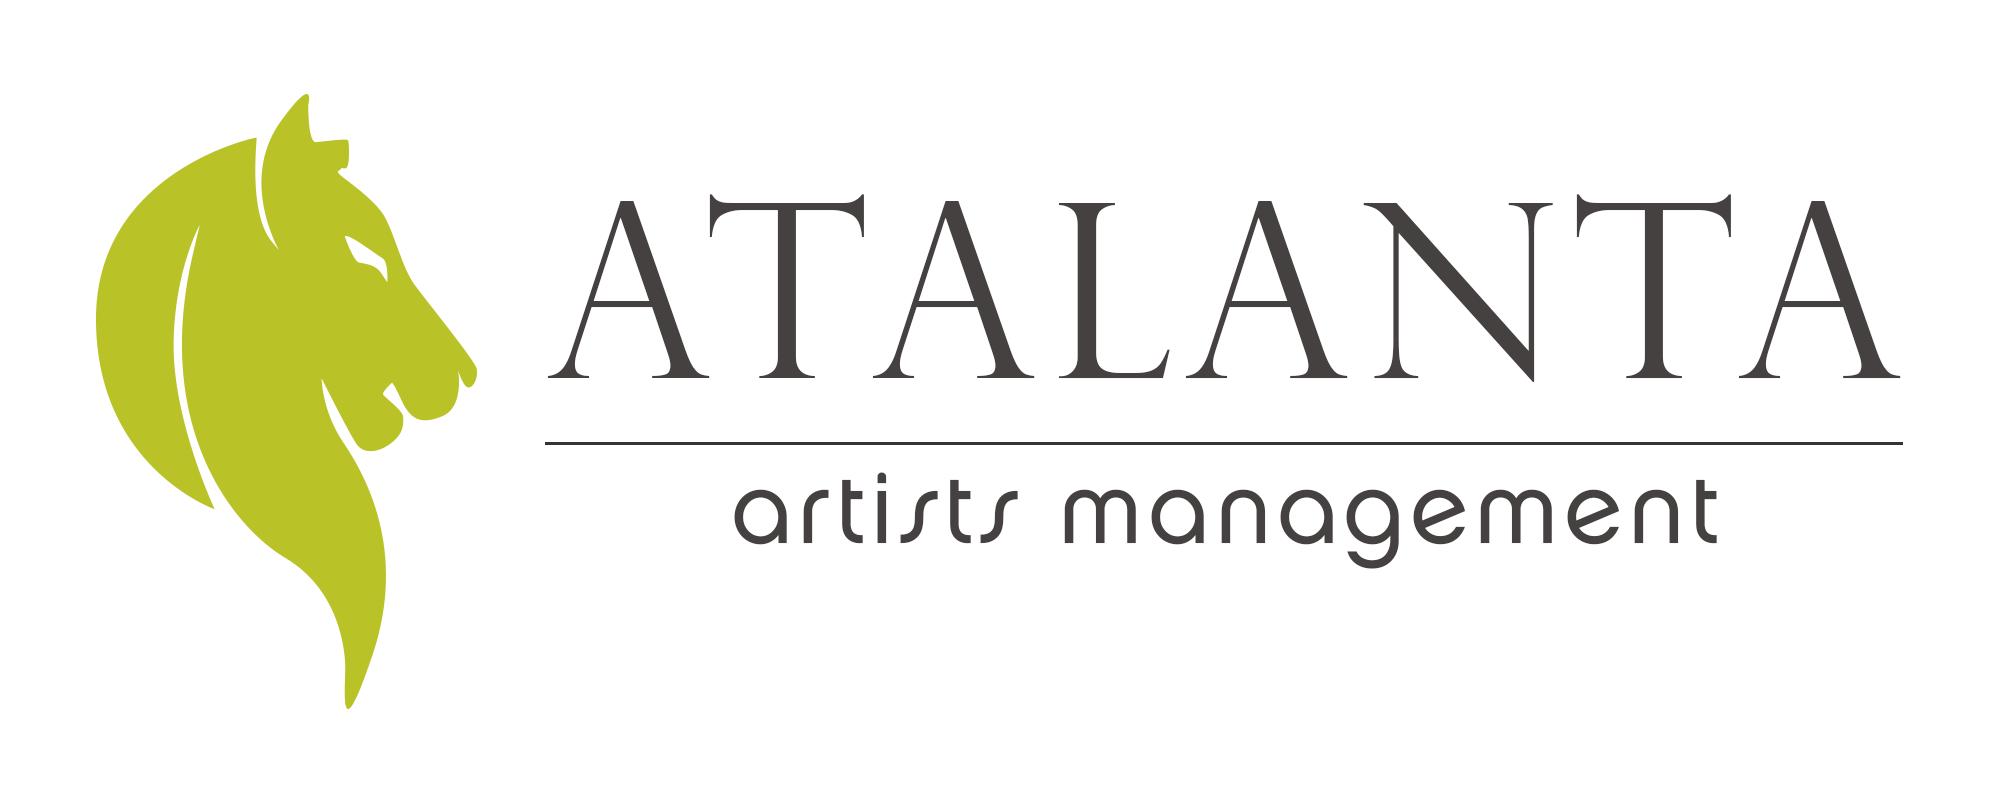 Atalanta Artists